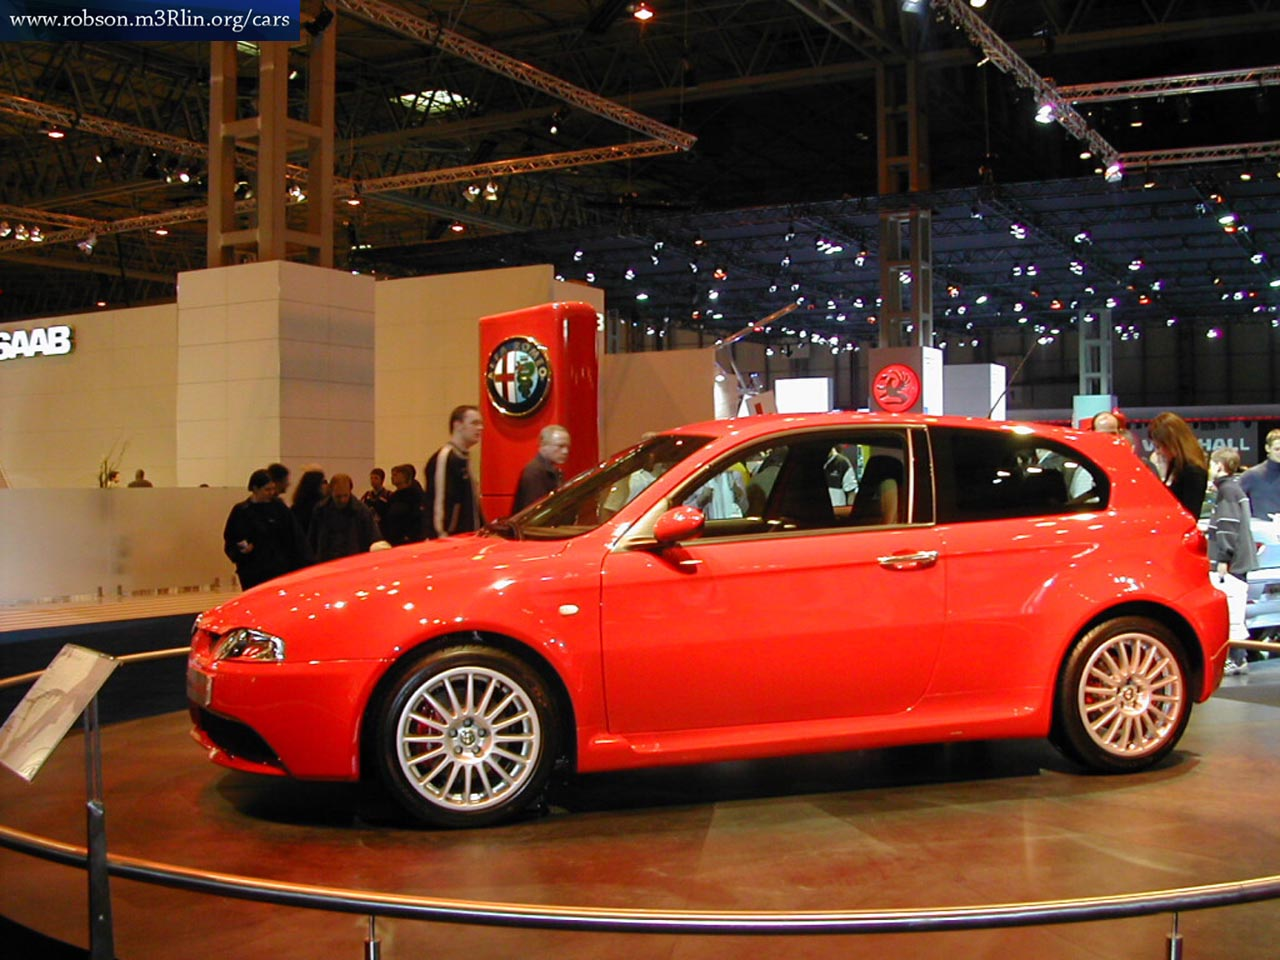 sports car alfa romeo 147 2003. Black Bedroom Furniture Sets. Home Design Ideas